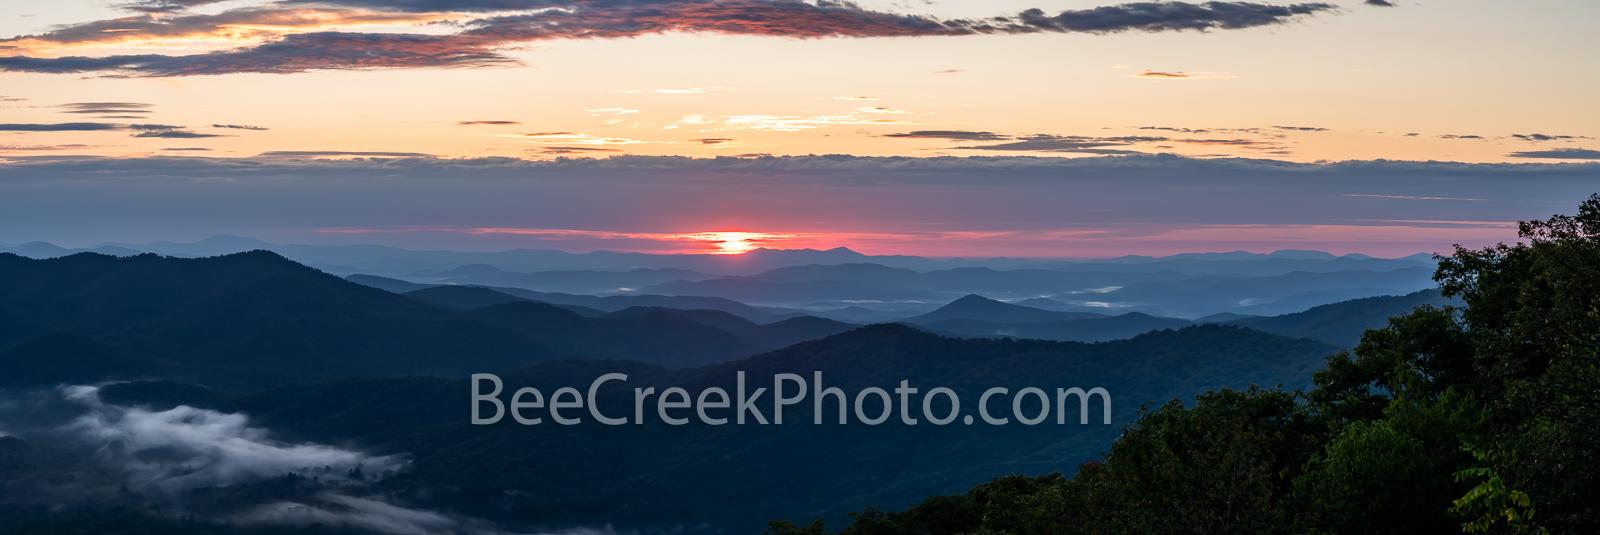 Sunrise, Blue Ridge Mountains, smoky mountains, blue ridge parkway, smoky national park, north carolina, Tennessee, pano, panorama, great smoky mountains, landscape, applachians, mountains, scenic, ov, photo